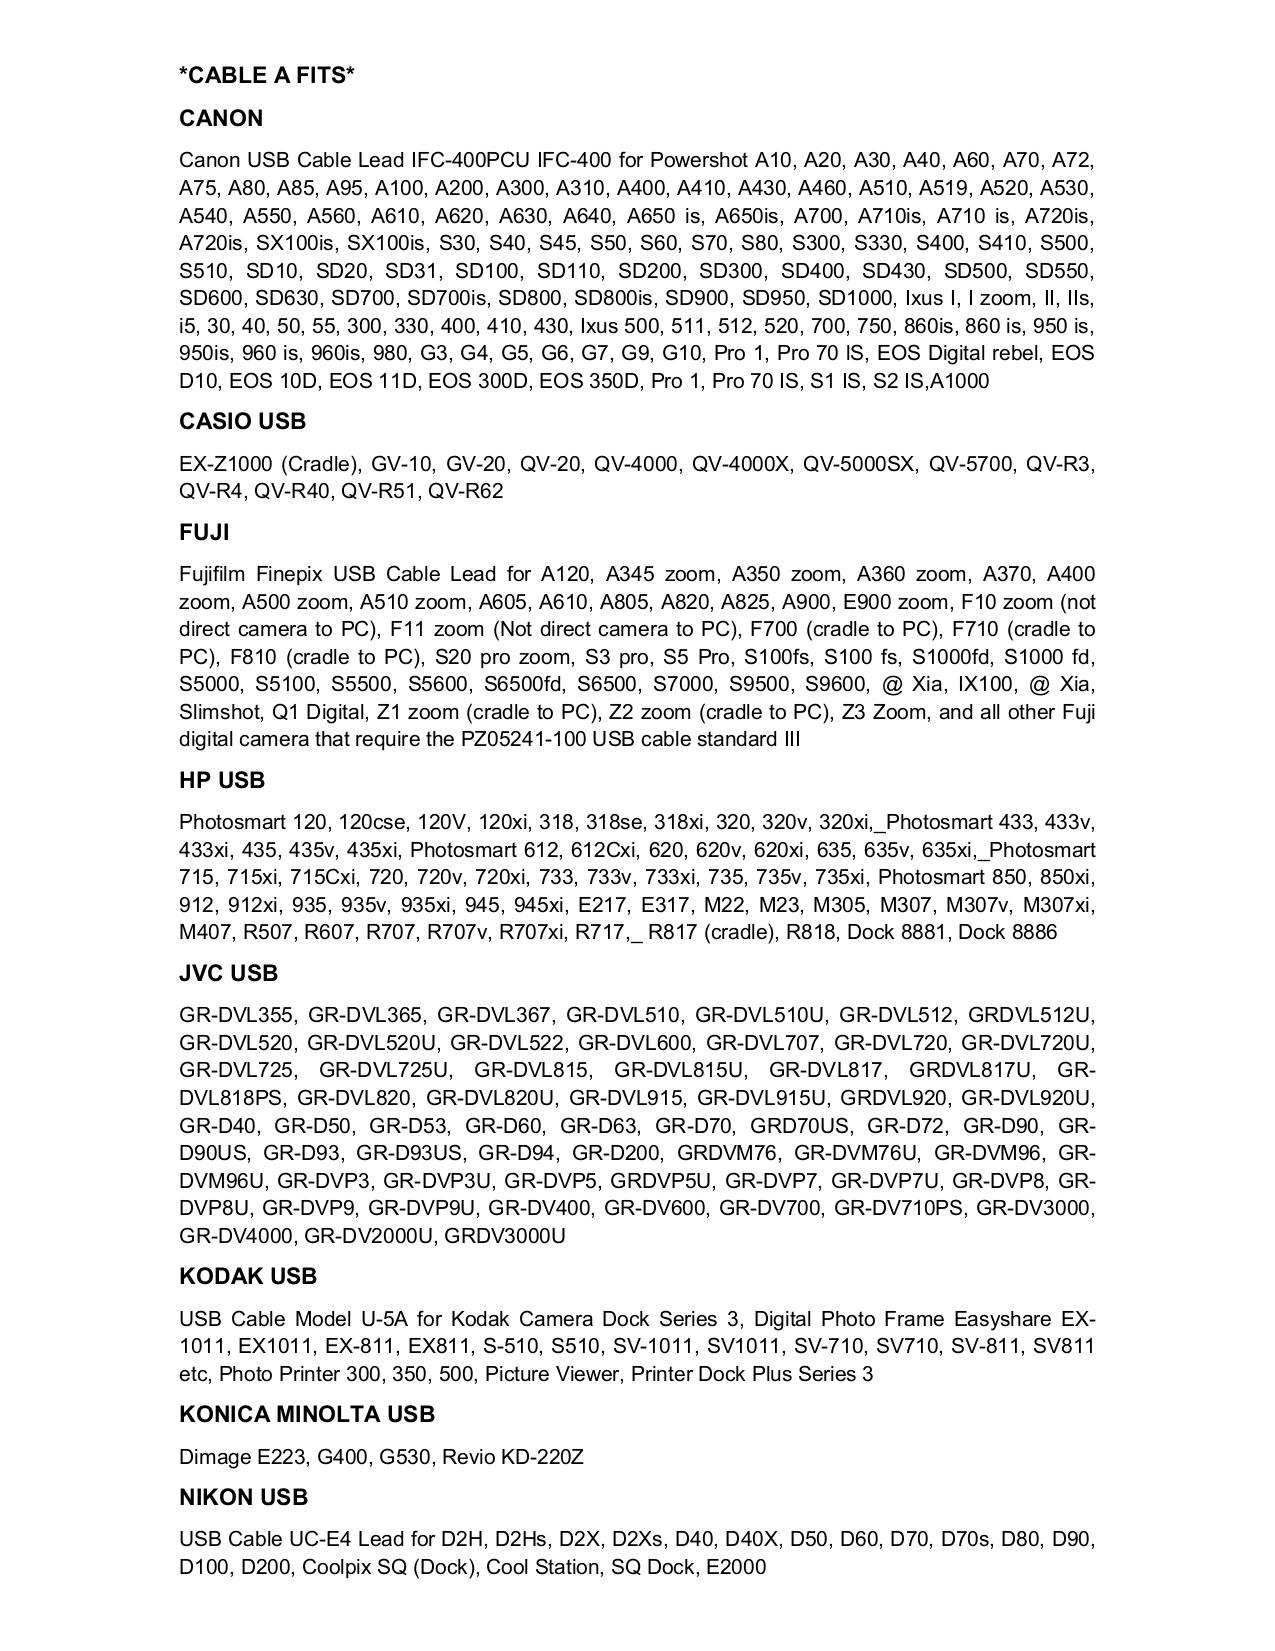 pdf for Kodak Digital Photo Frame EasyShare S510 manual